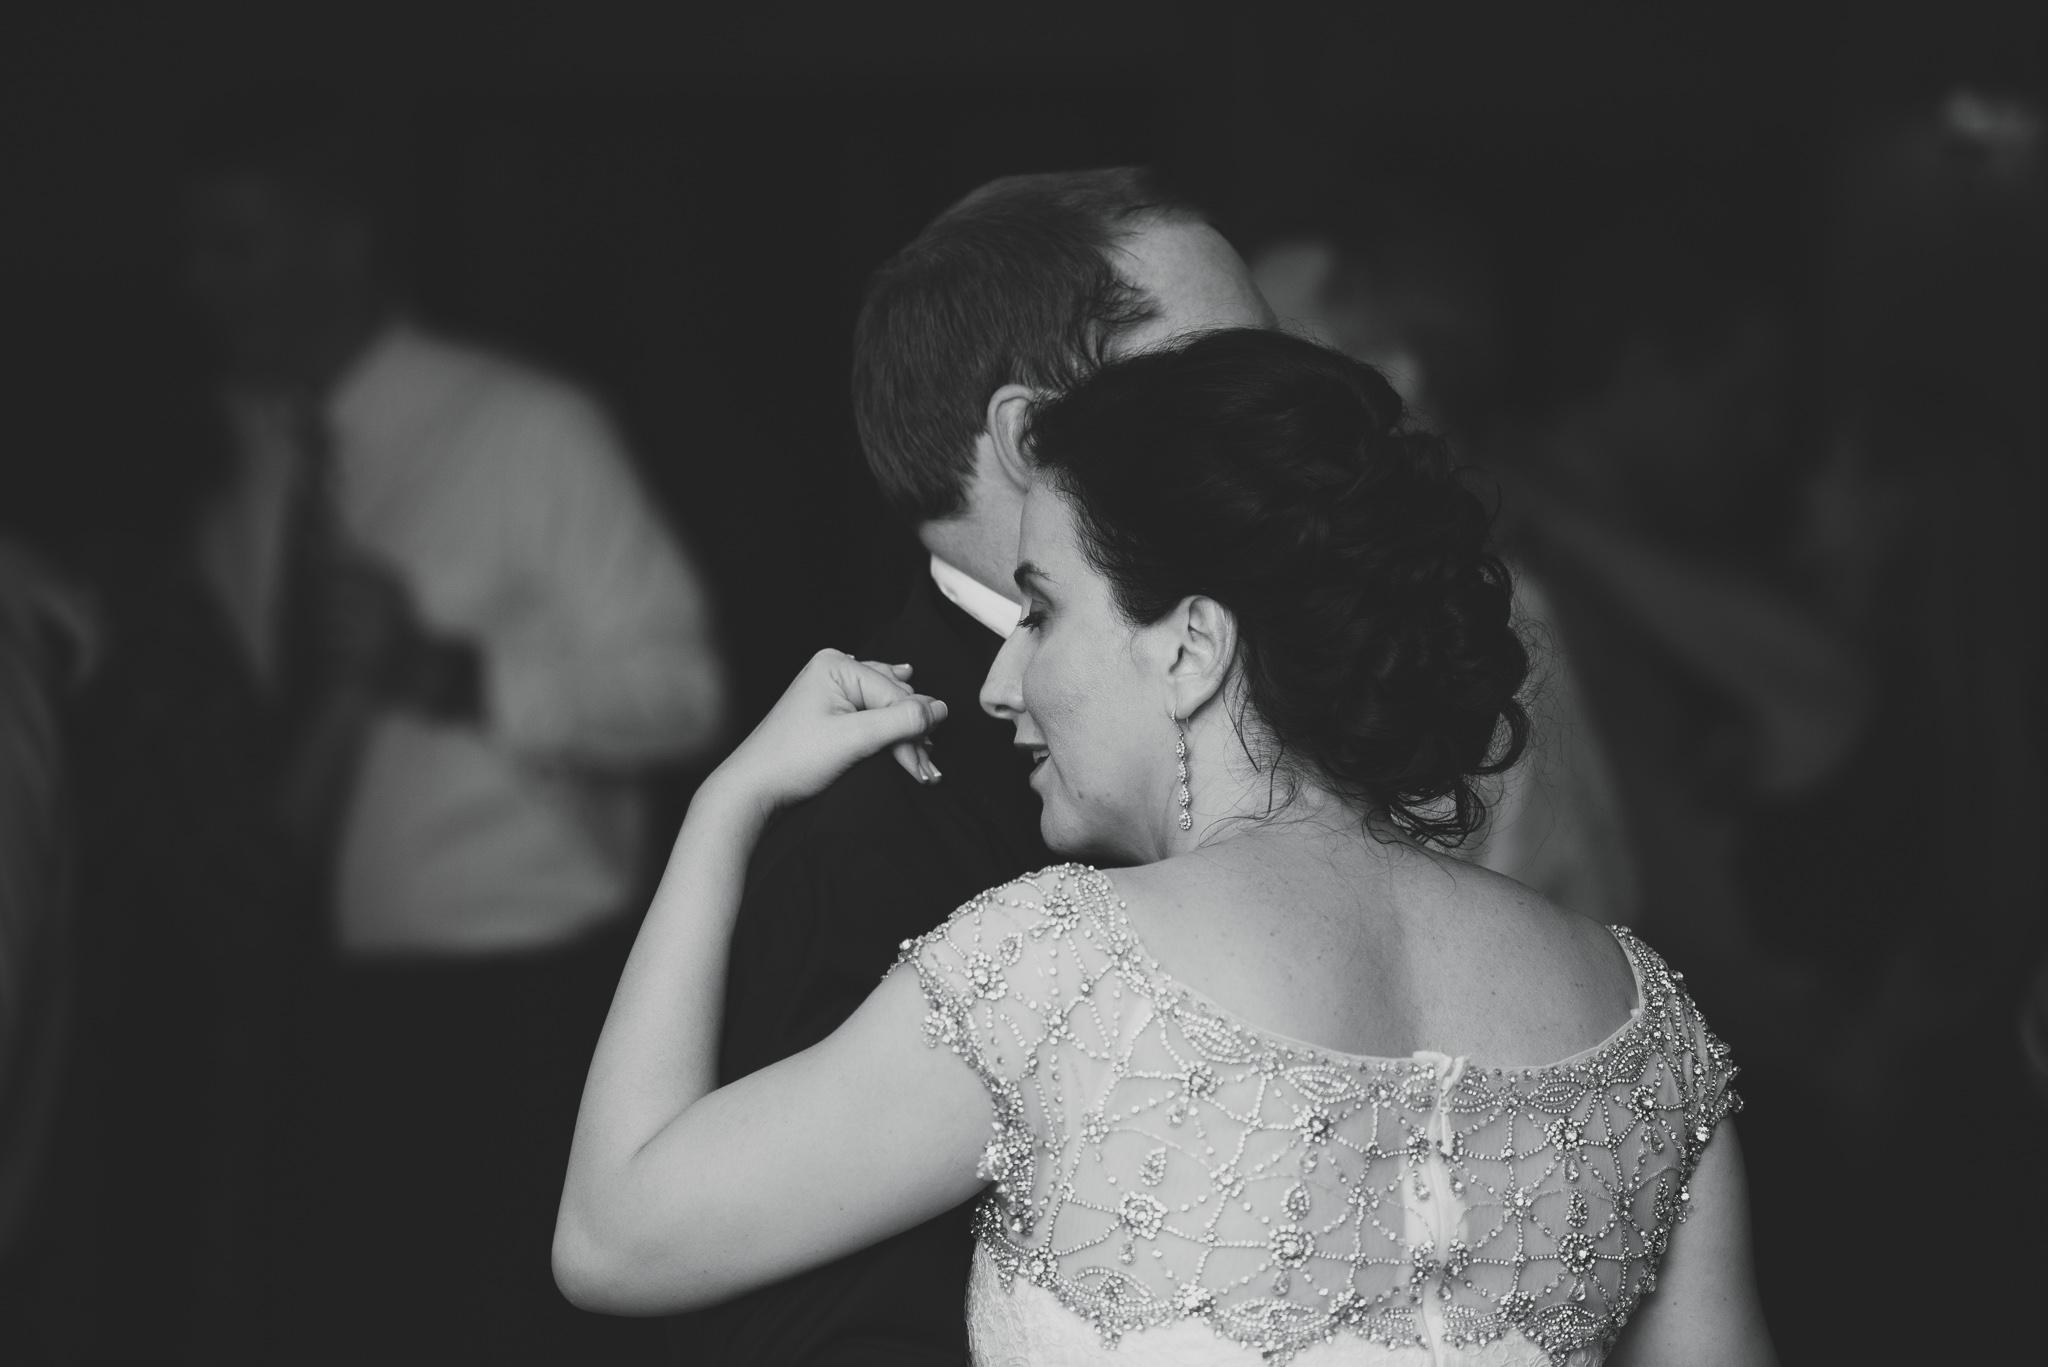 Nil-poconos-engagement-wedding-photographer-1.jpg